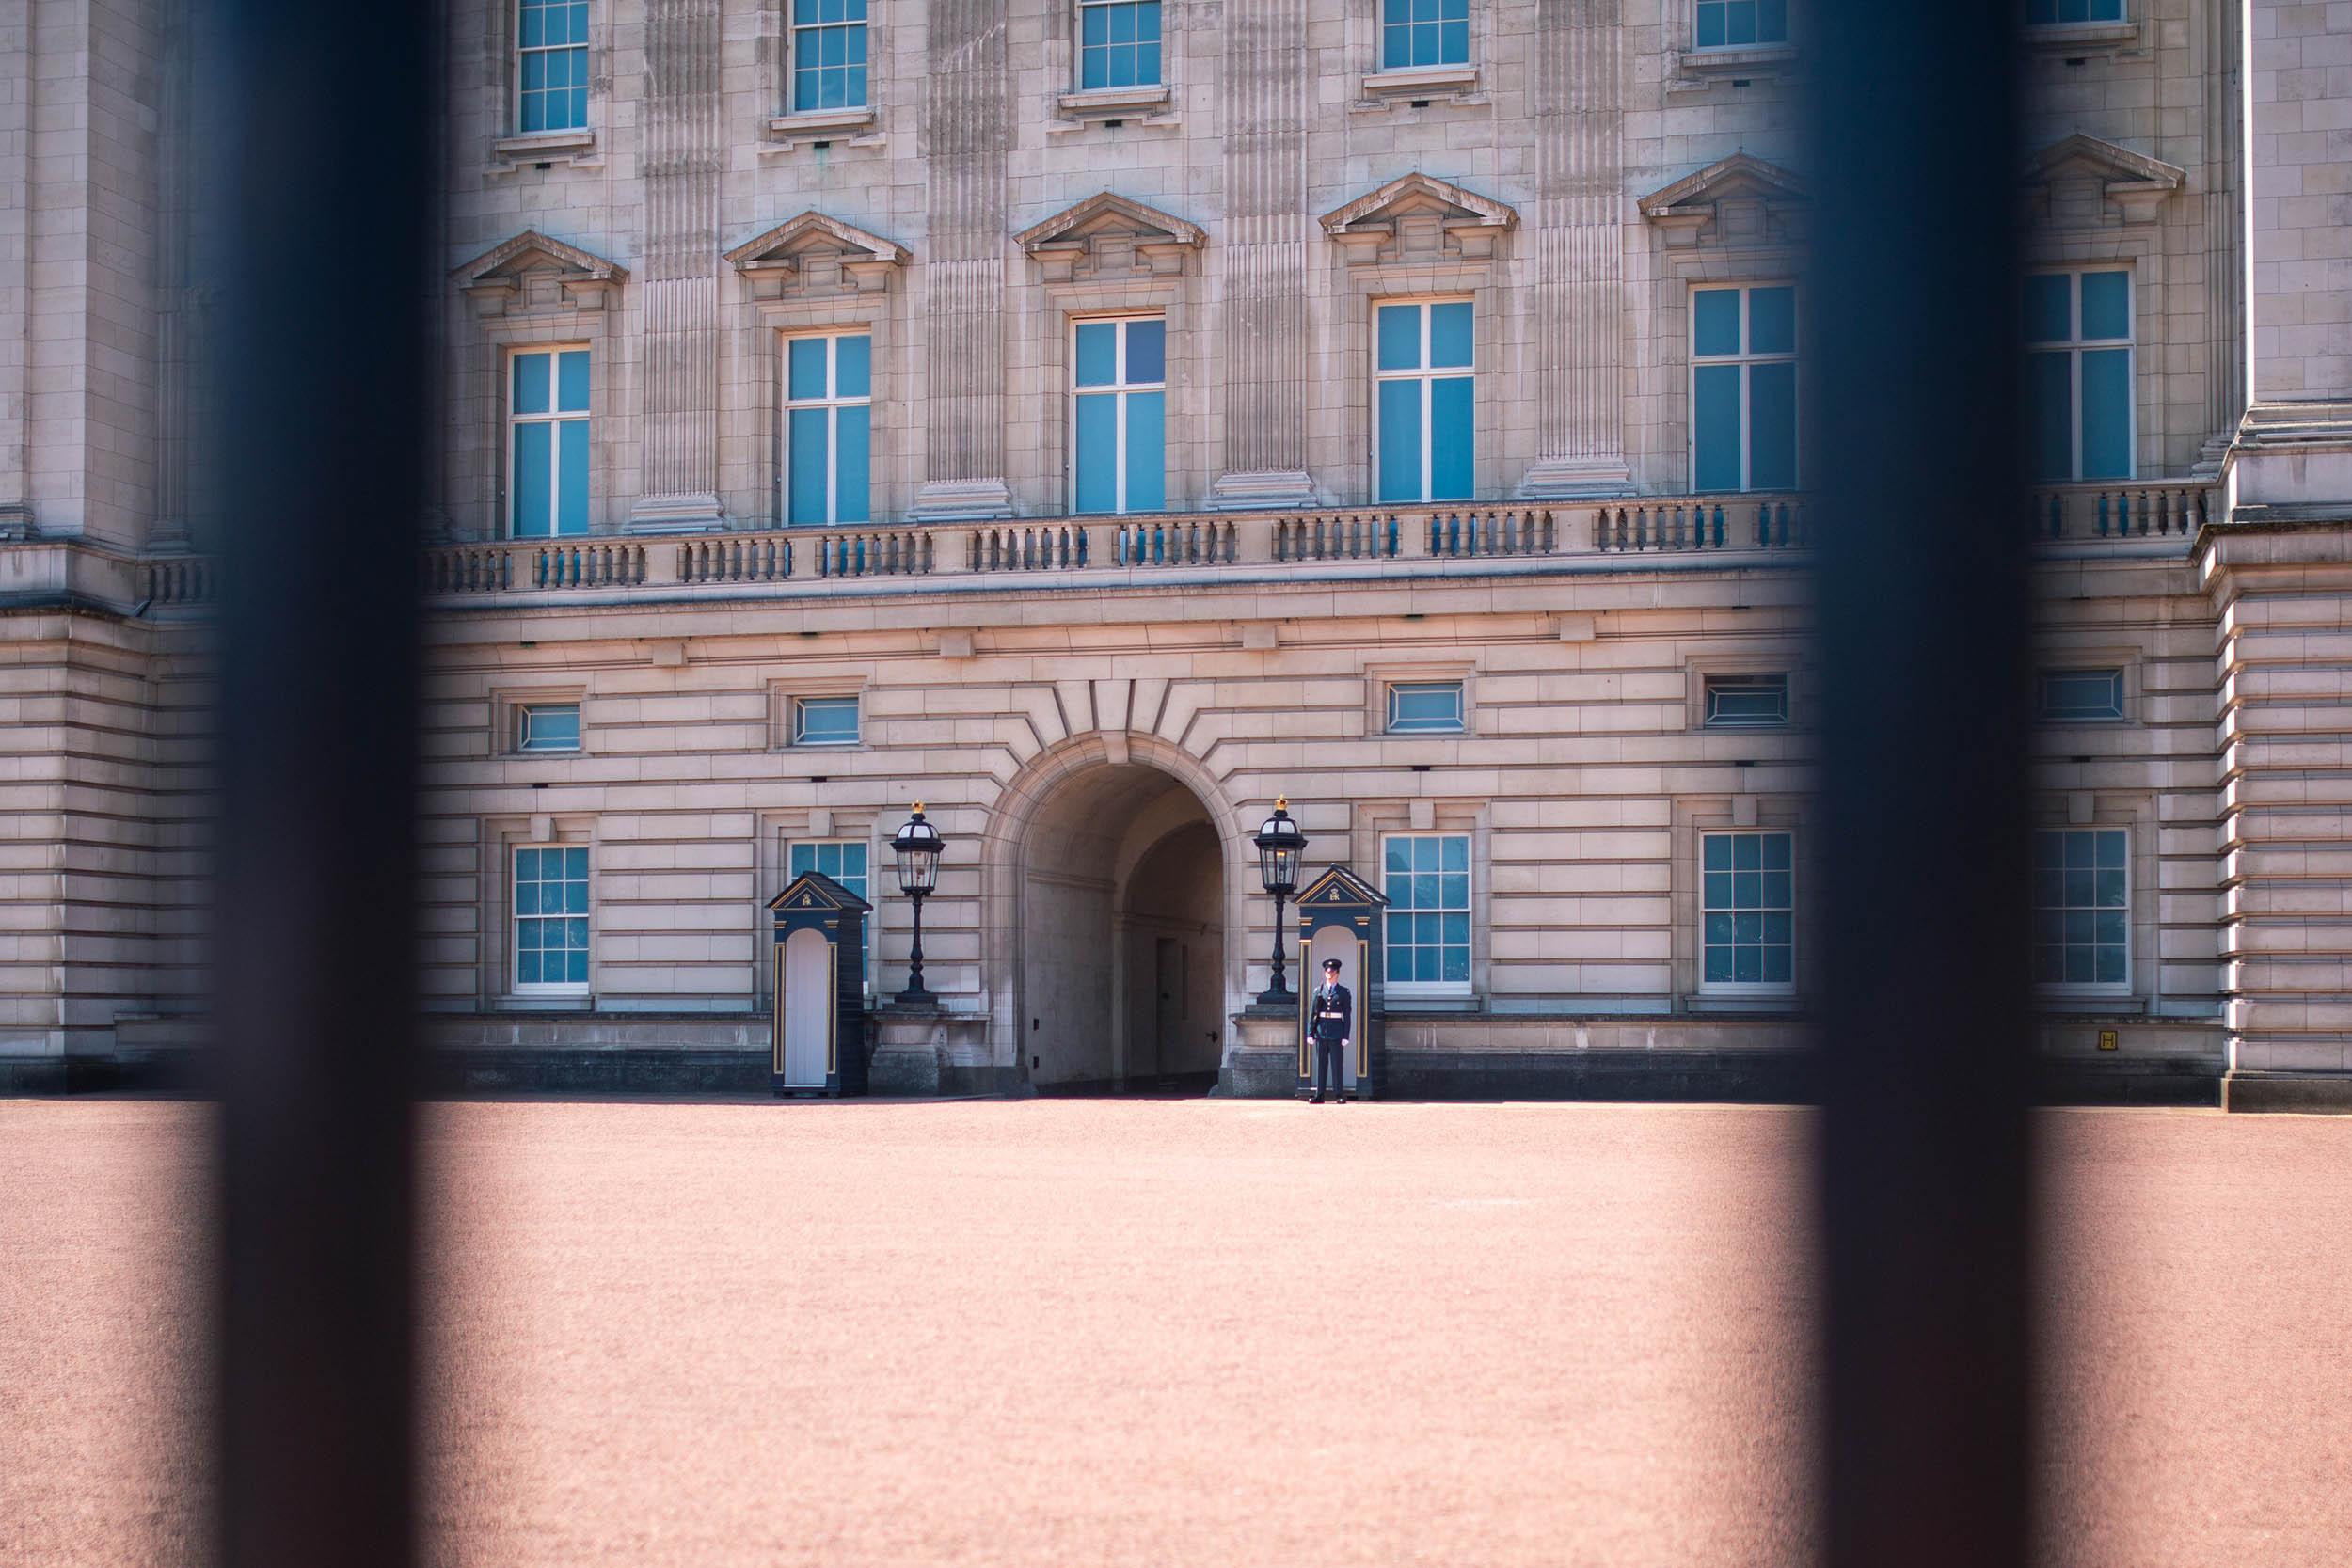 ENGLAND_LONDON_BUCKINGHAMPALACE_0011